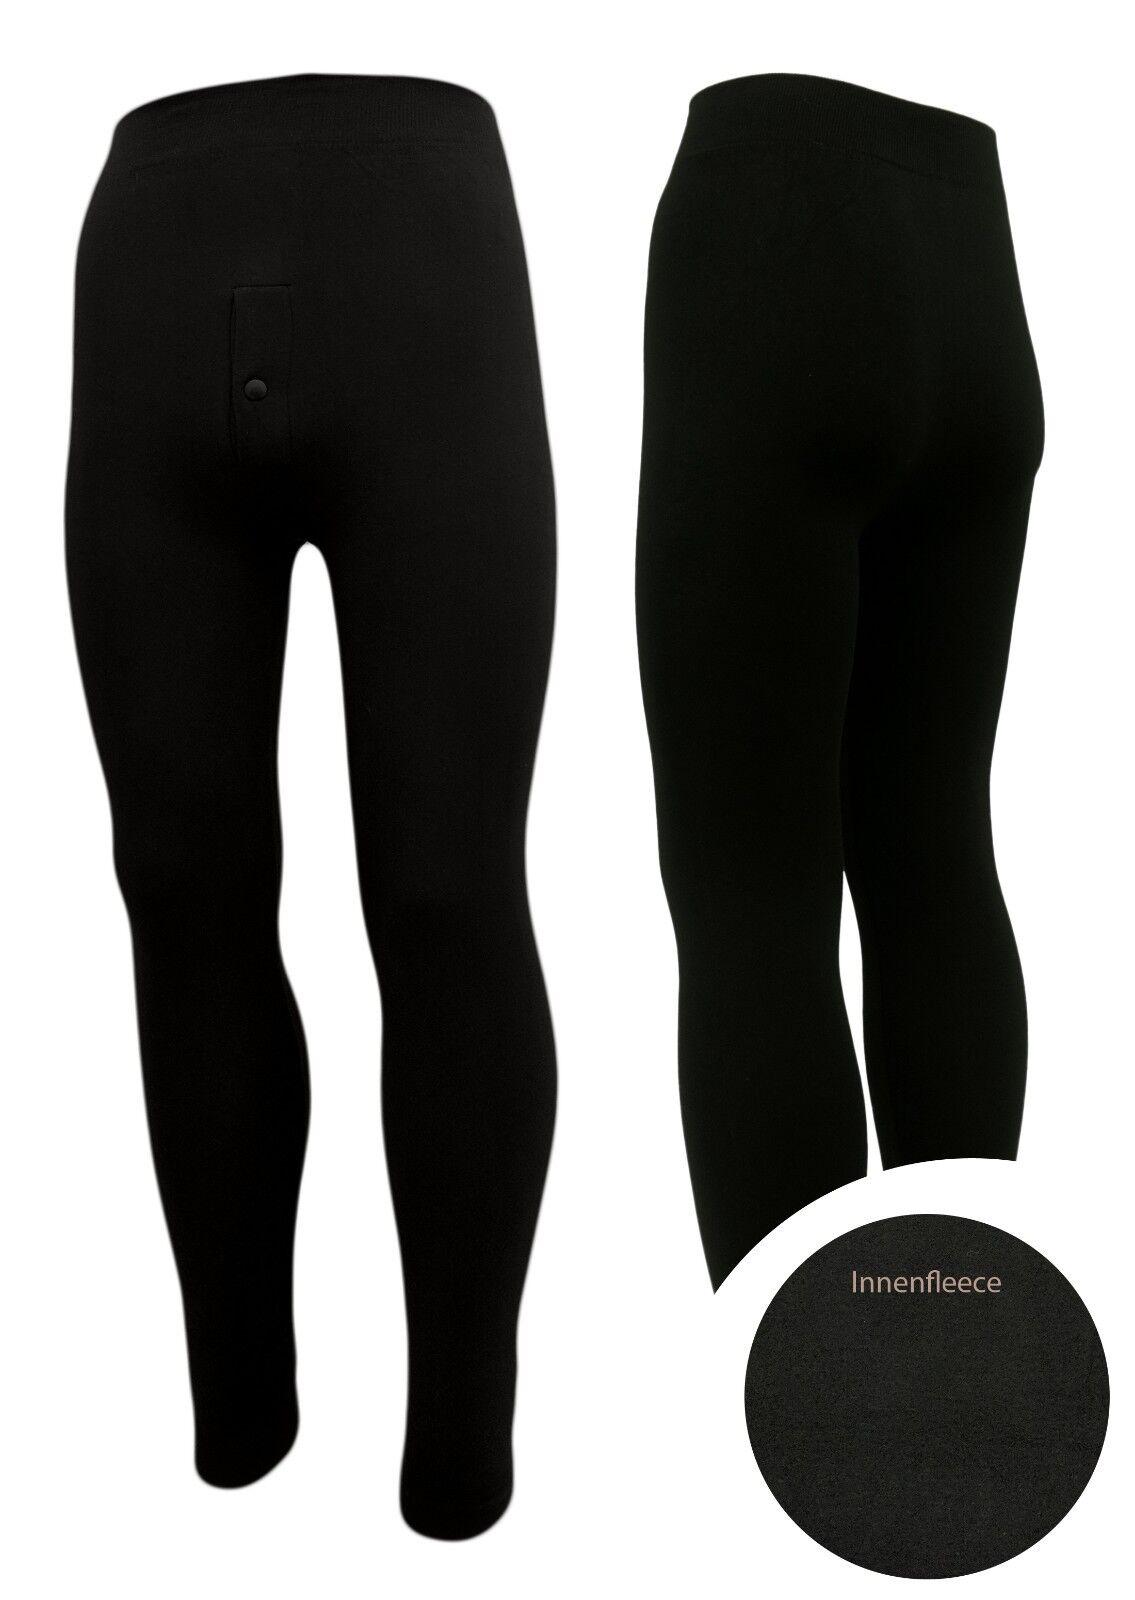 Lange Thermo-Unterhose anliegend Männer Winter-Leggings  2er Set - 85% Baumwolle